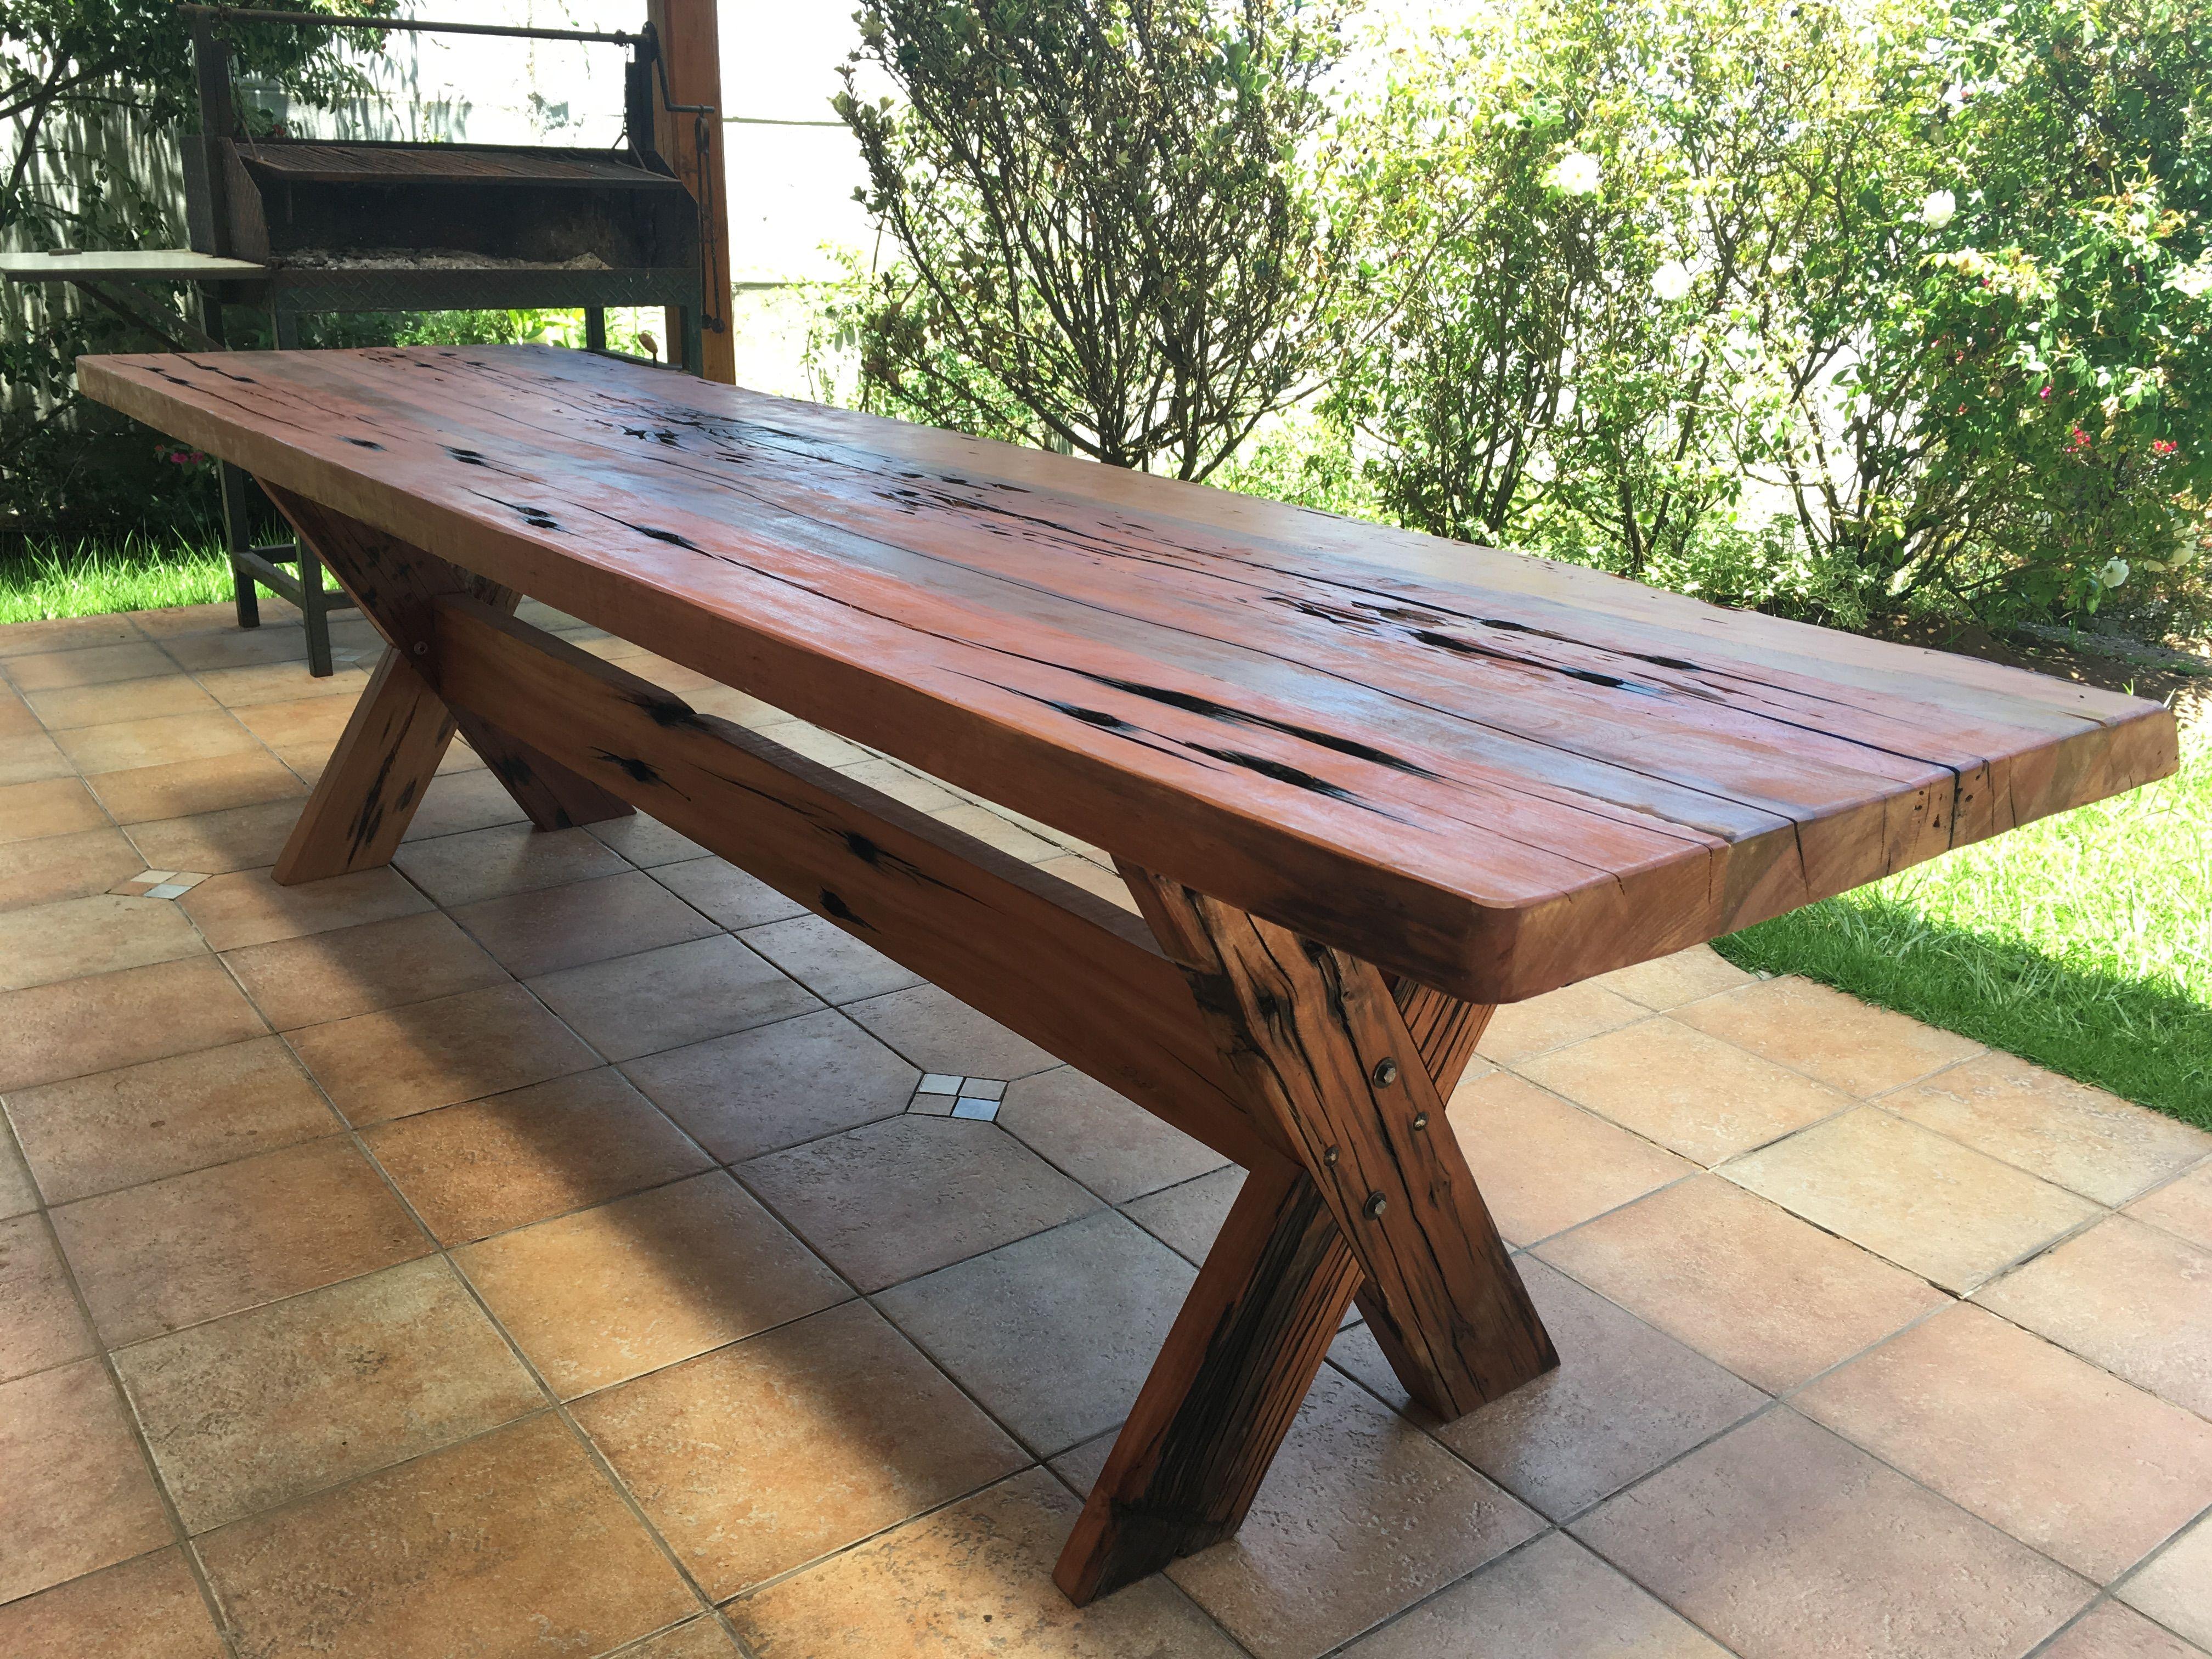 Mesa r stica de durmientes de roble ideal para quincho o terraza dimensi n de 3 10 m de largo - Mesa rustica madera ...